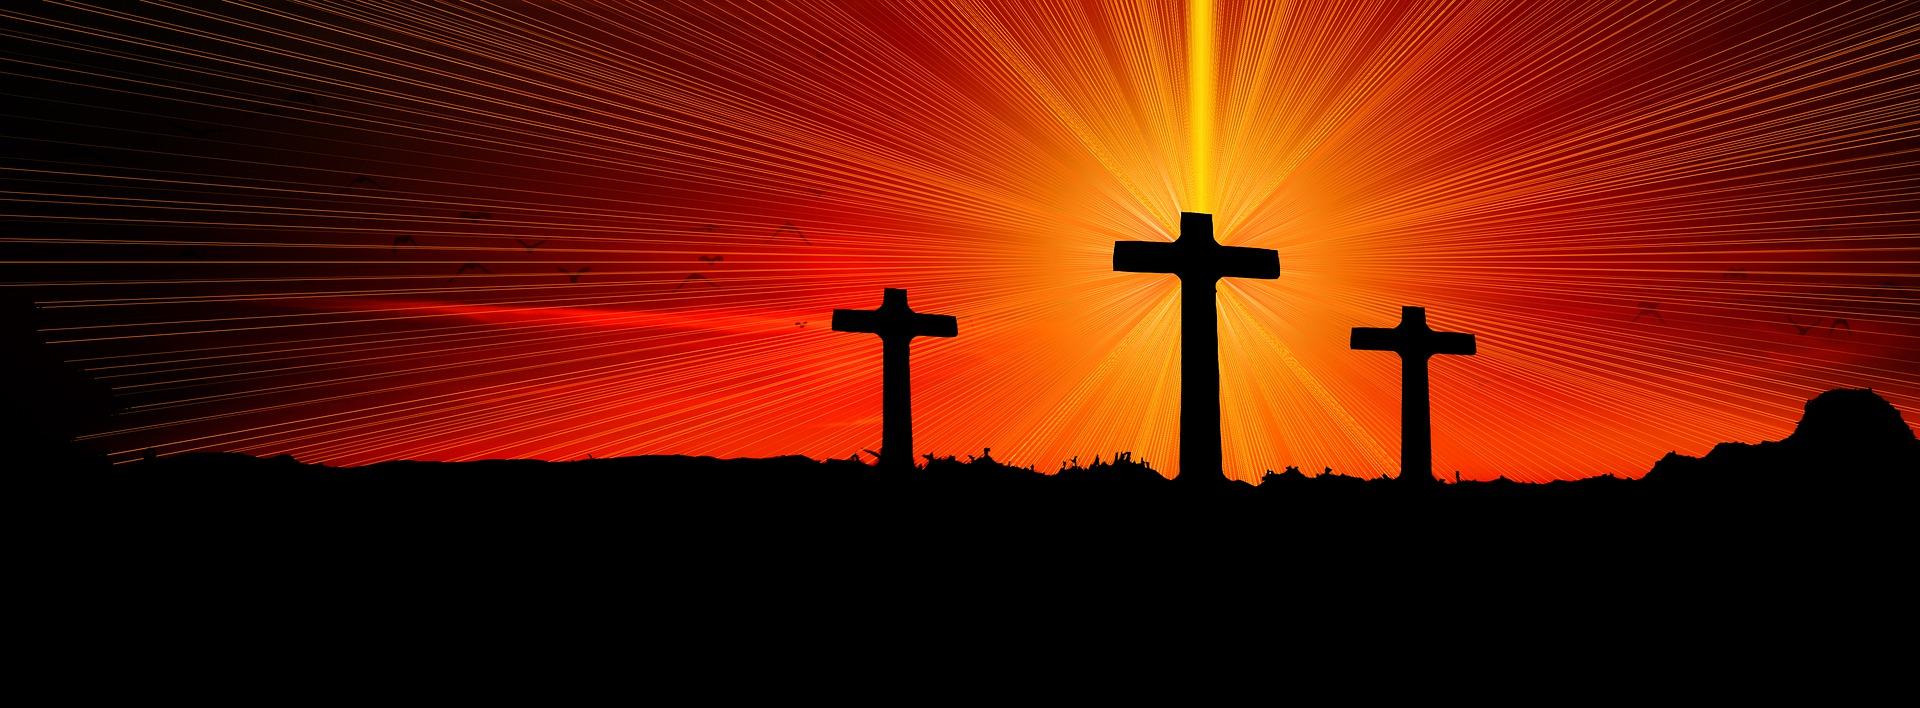 What a Strange Story: Resurrection Gospel Narratives